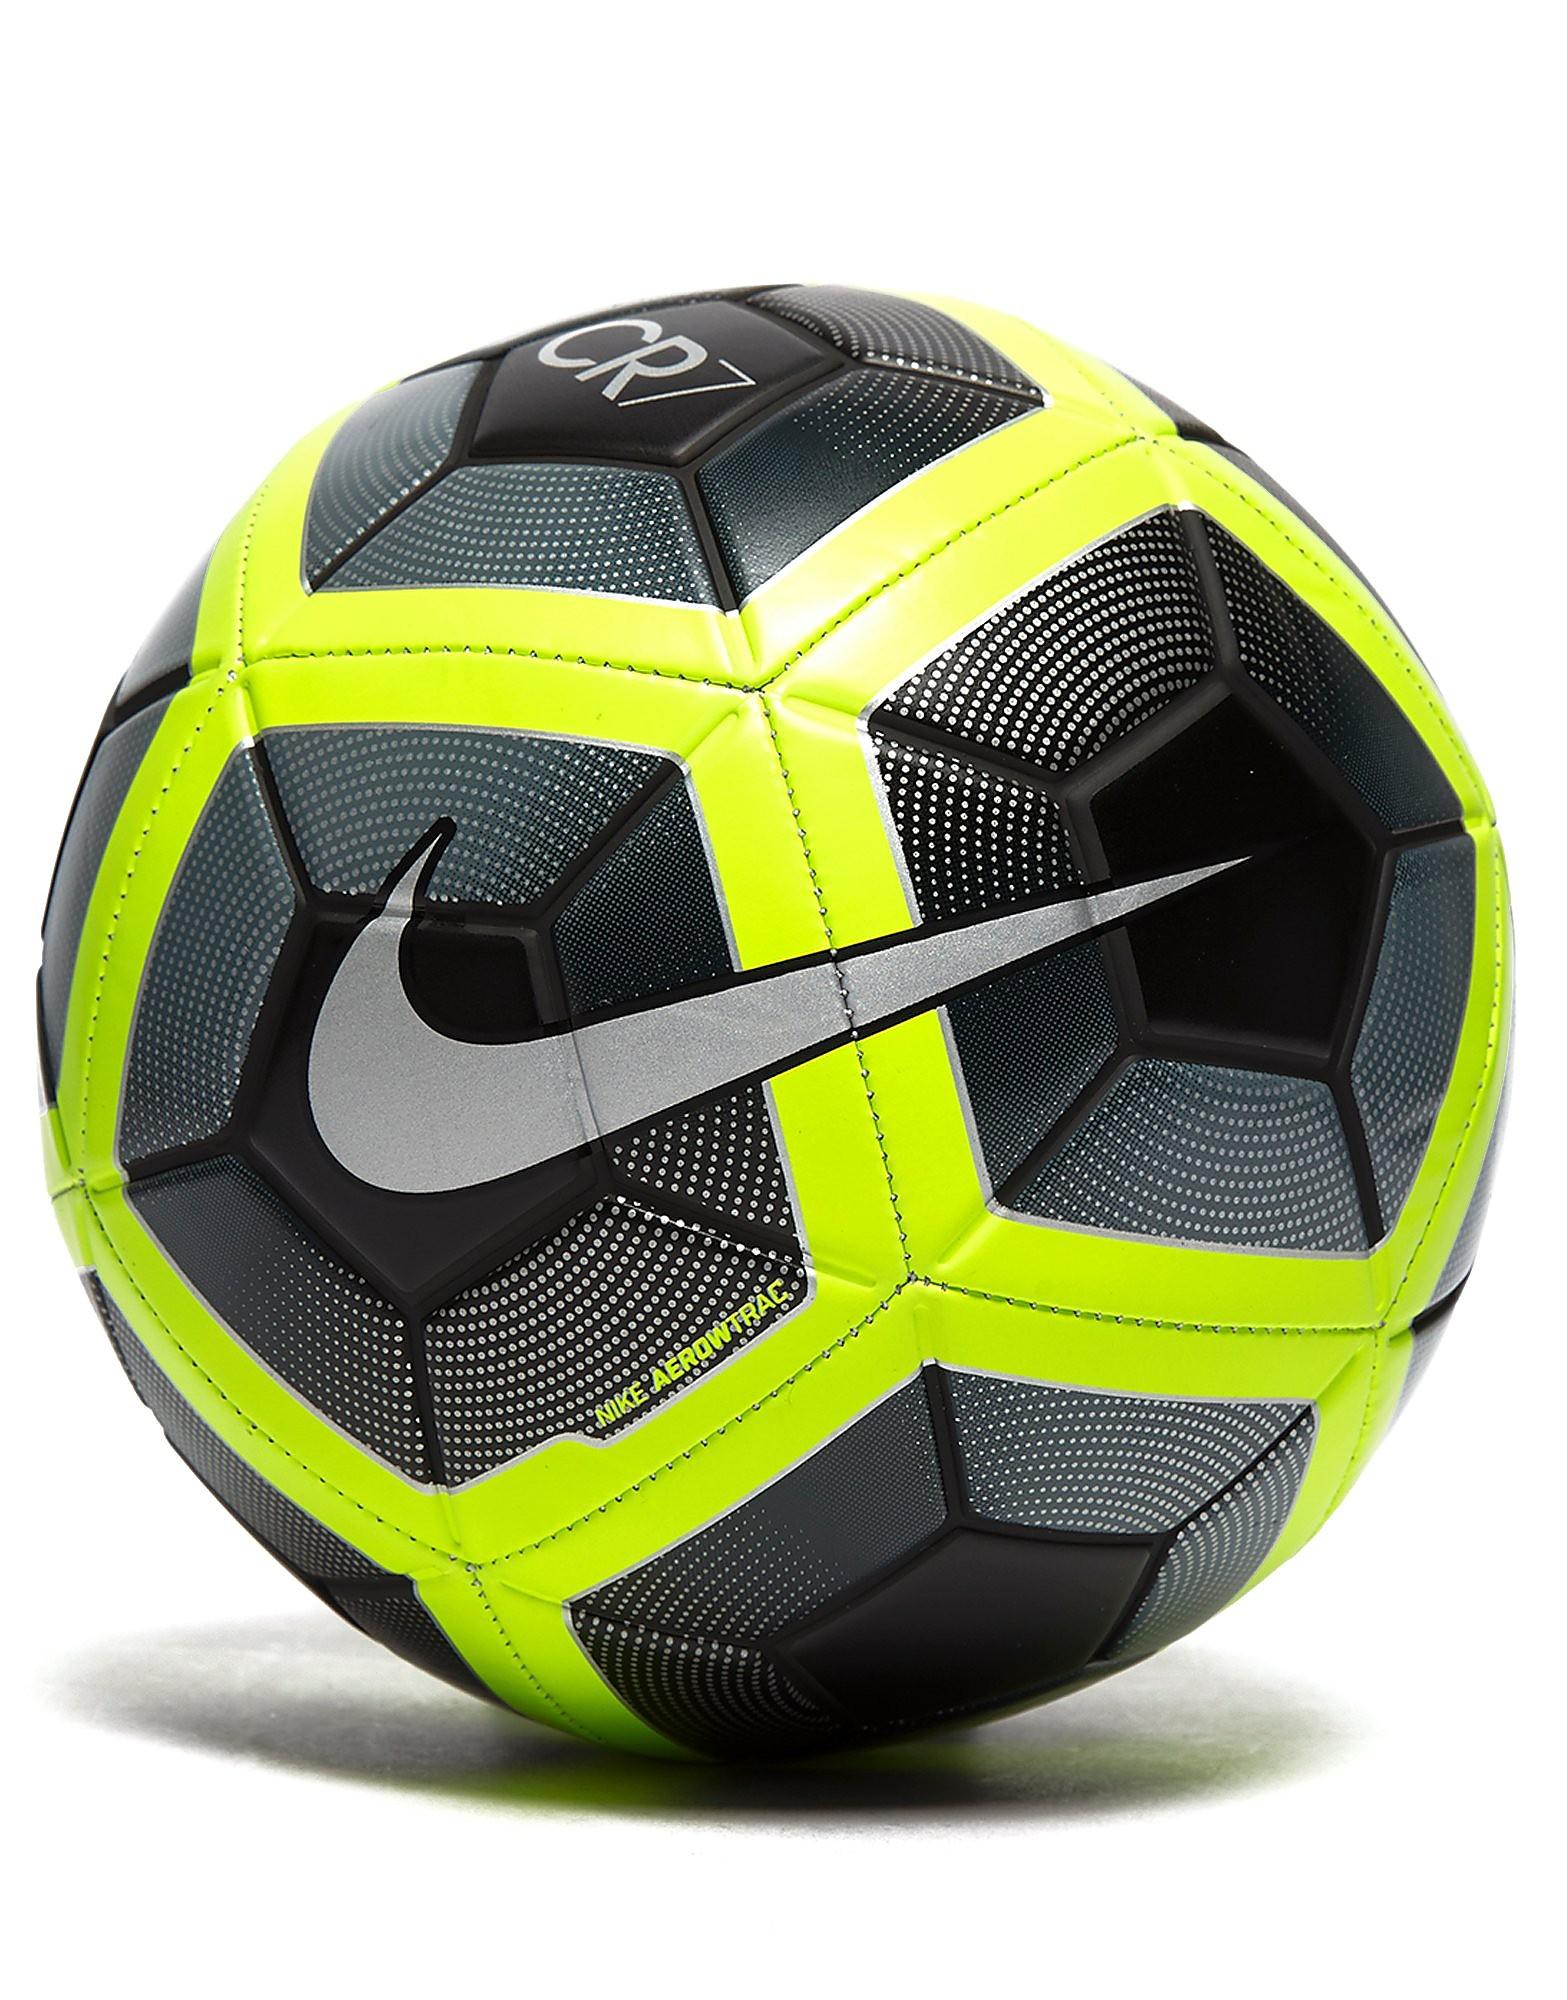 competitive price b70d2 405fa Nike CR7 Prestige Football – Black Volt – Mens